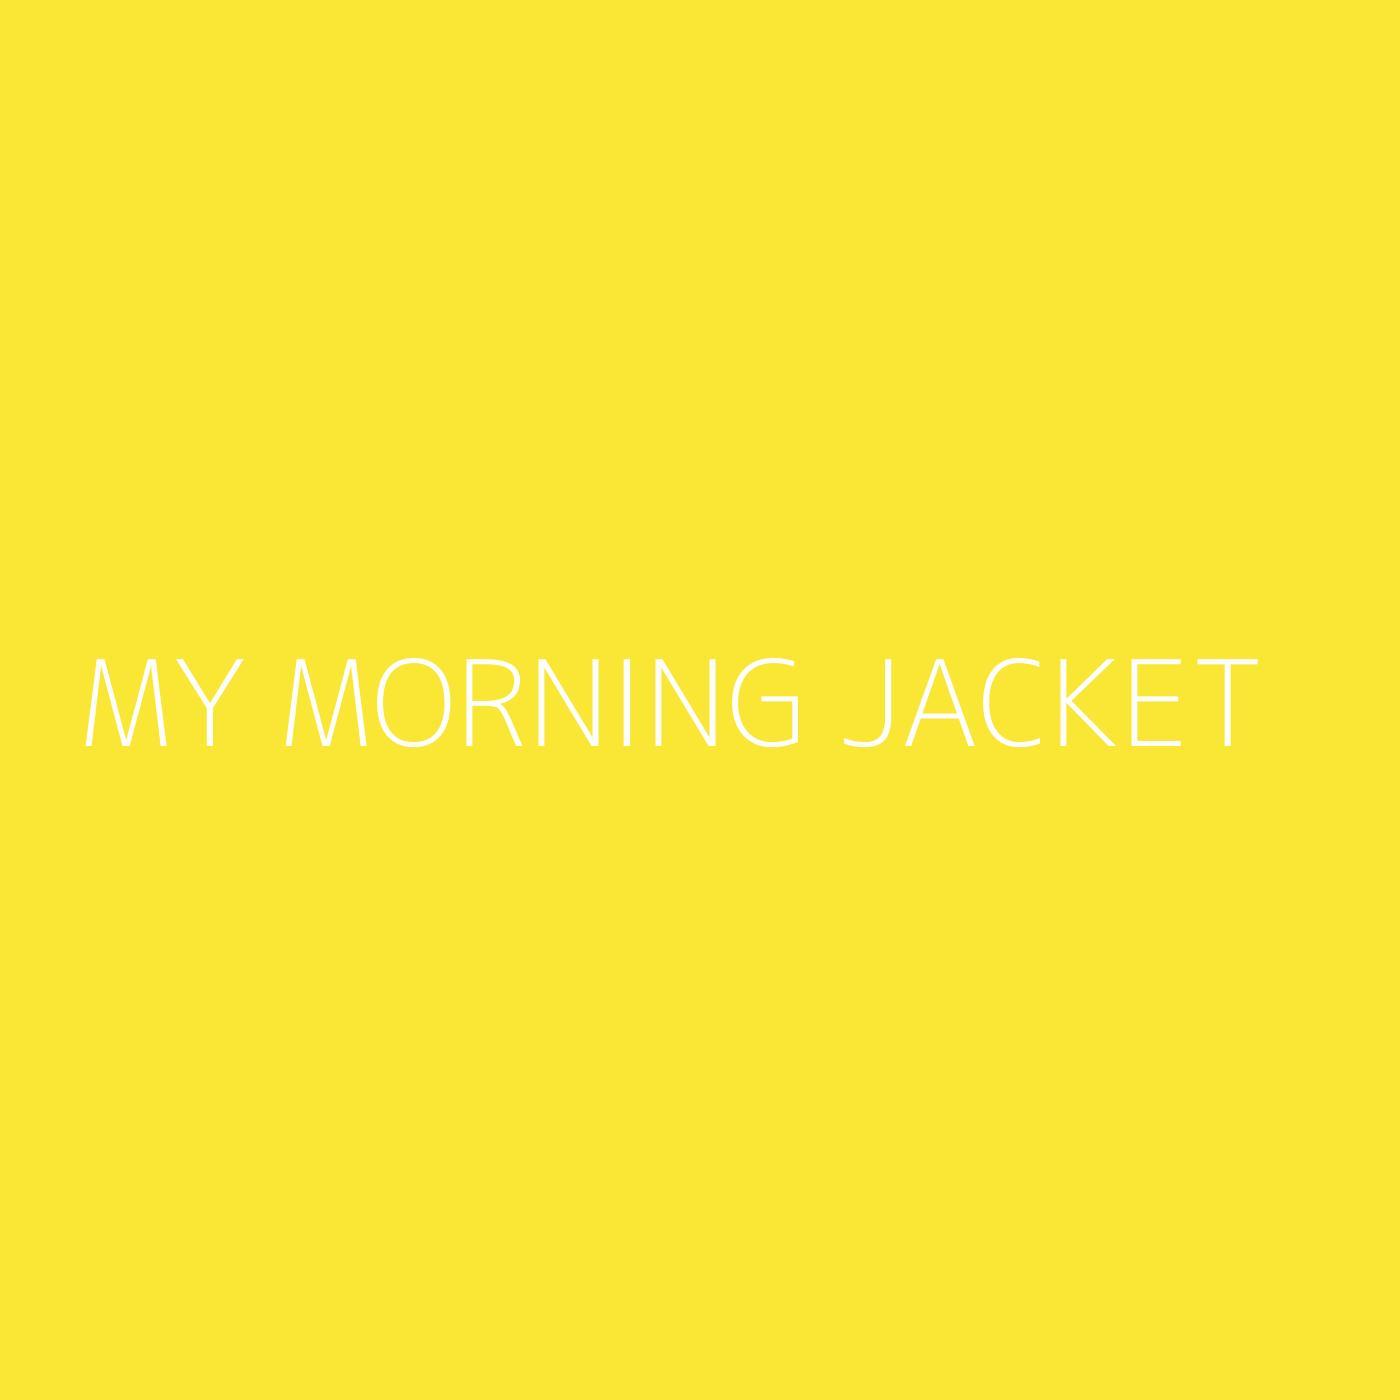 My Morning Jacket Playlist Artwork